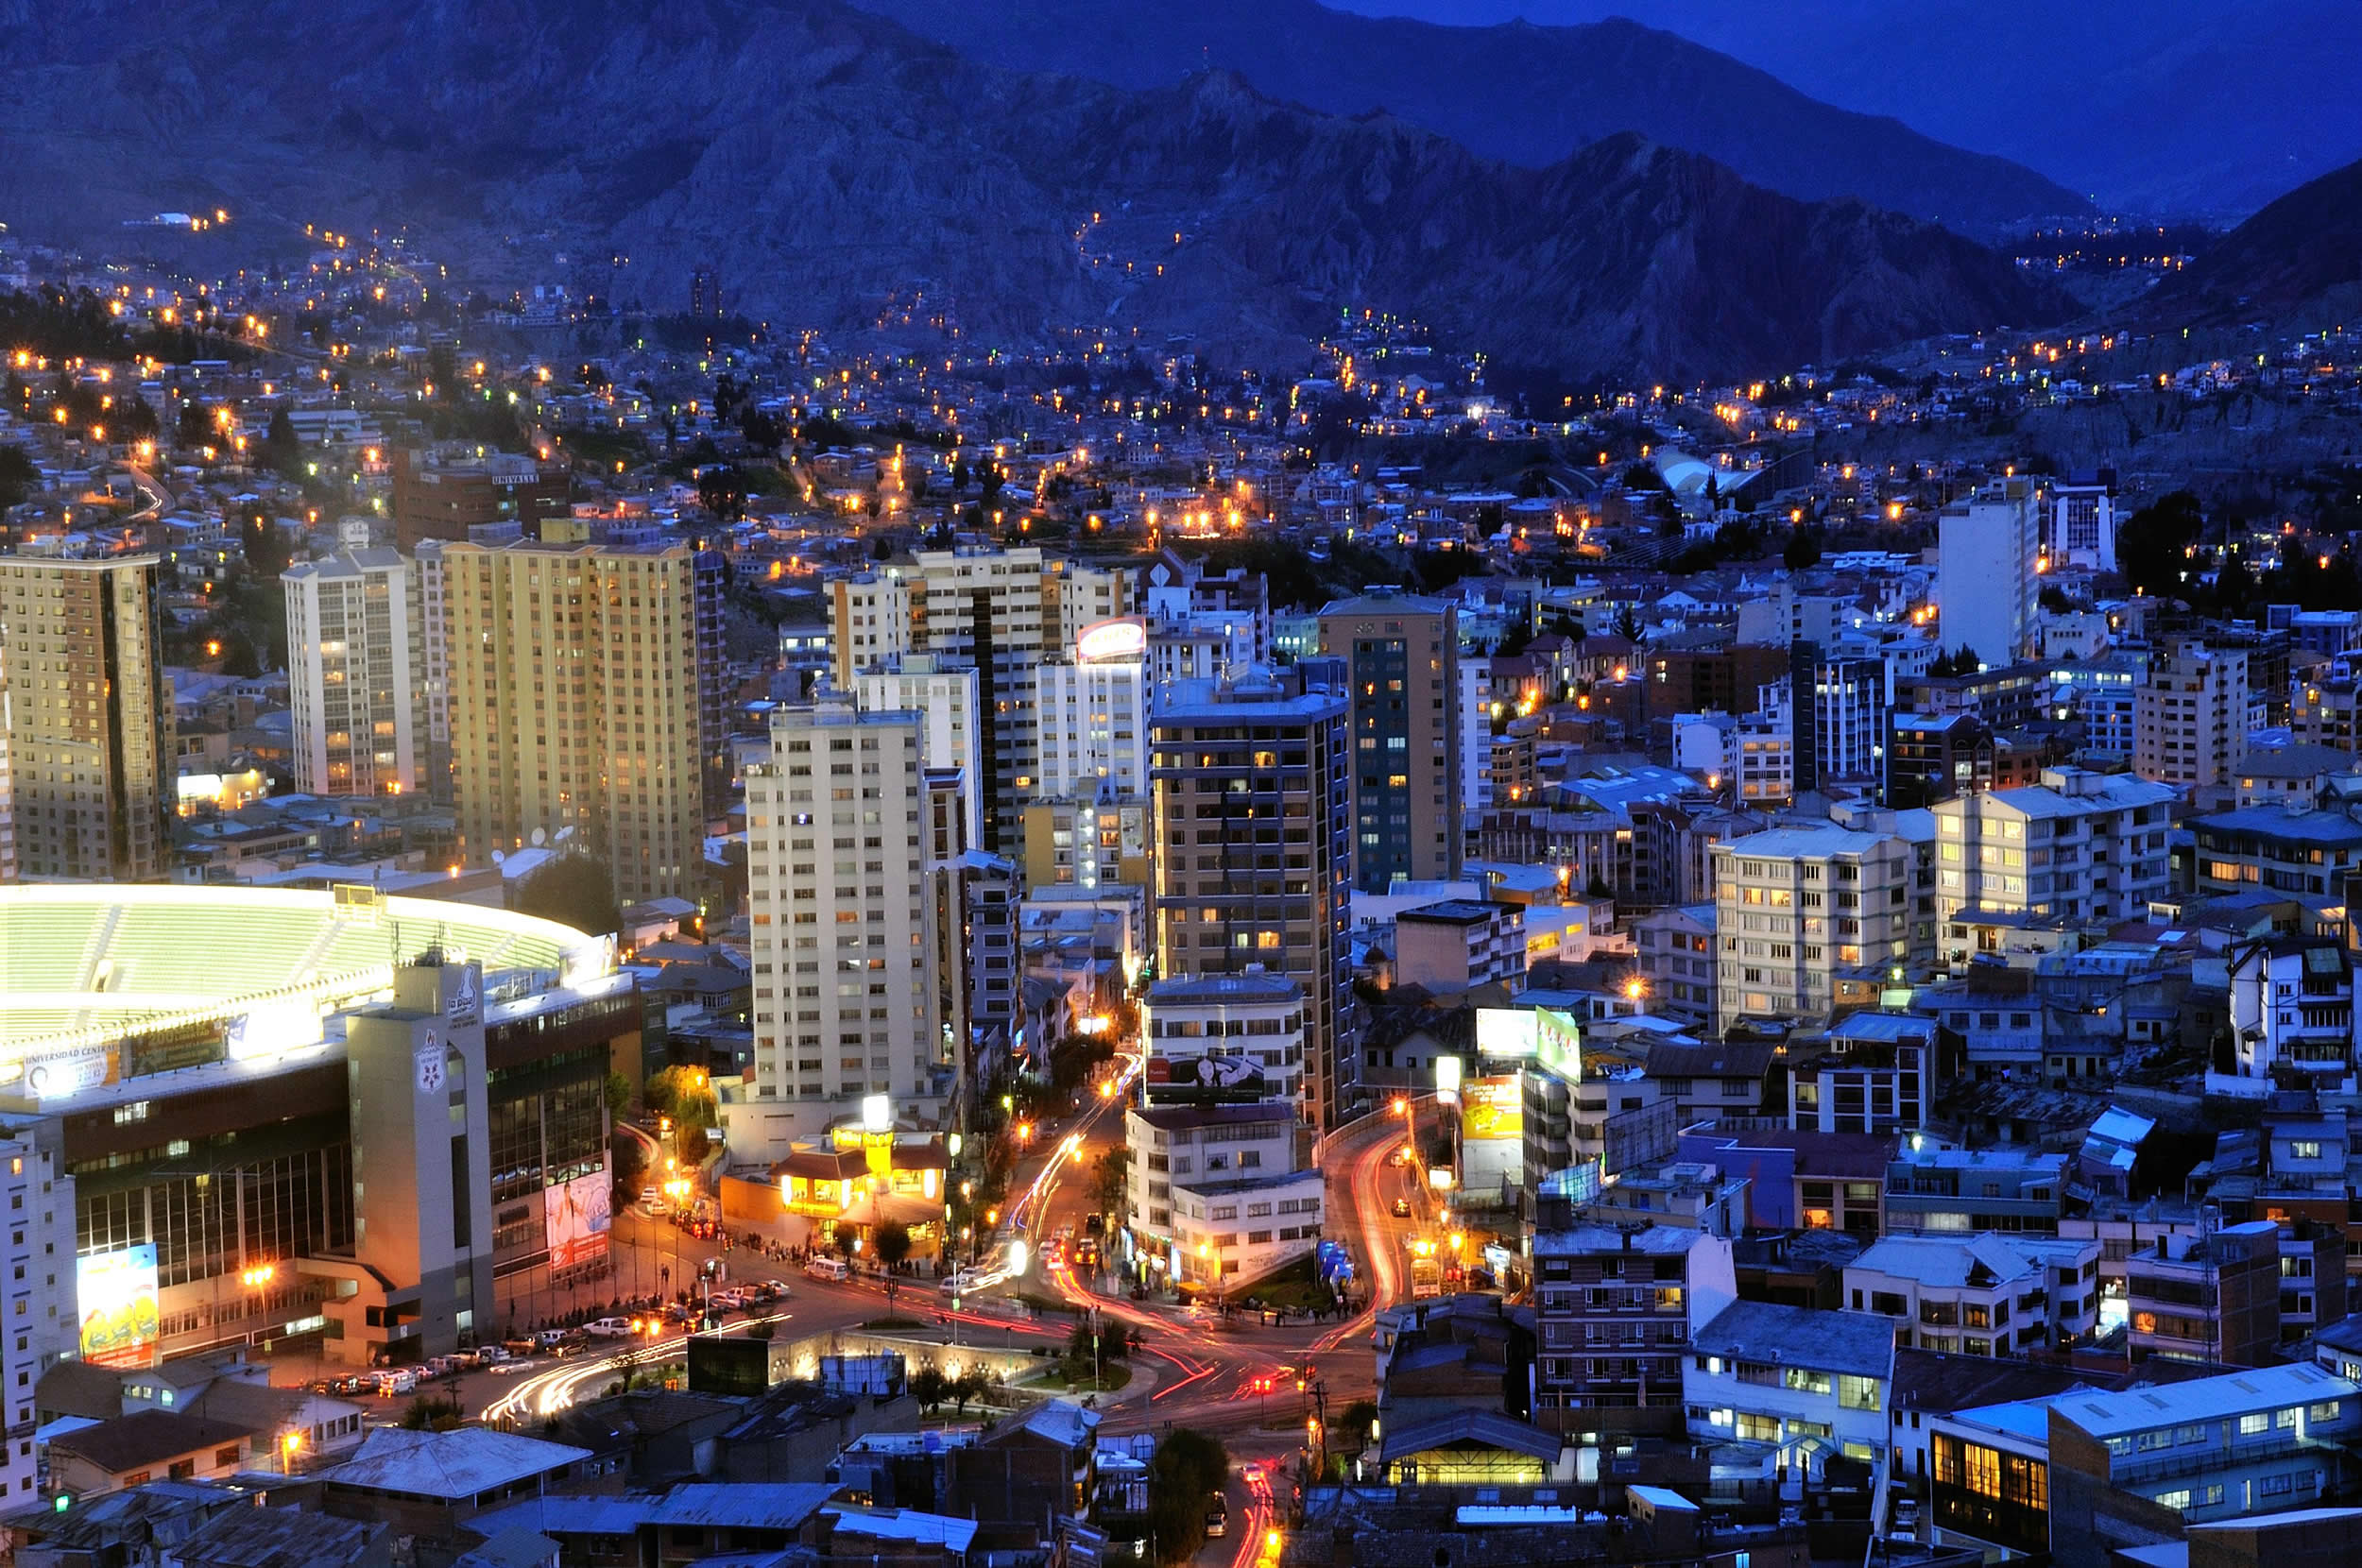 bolivia night HD Windows Wallpapers 2500x1660